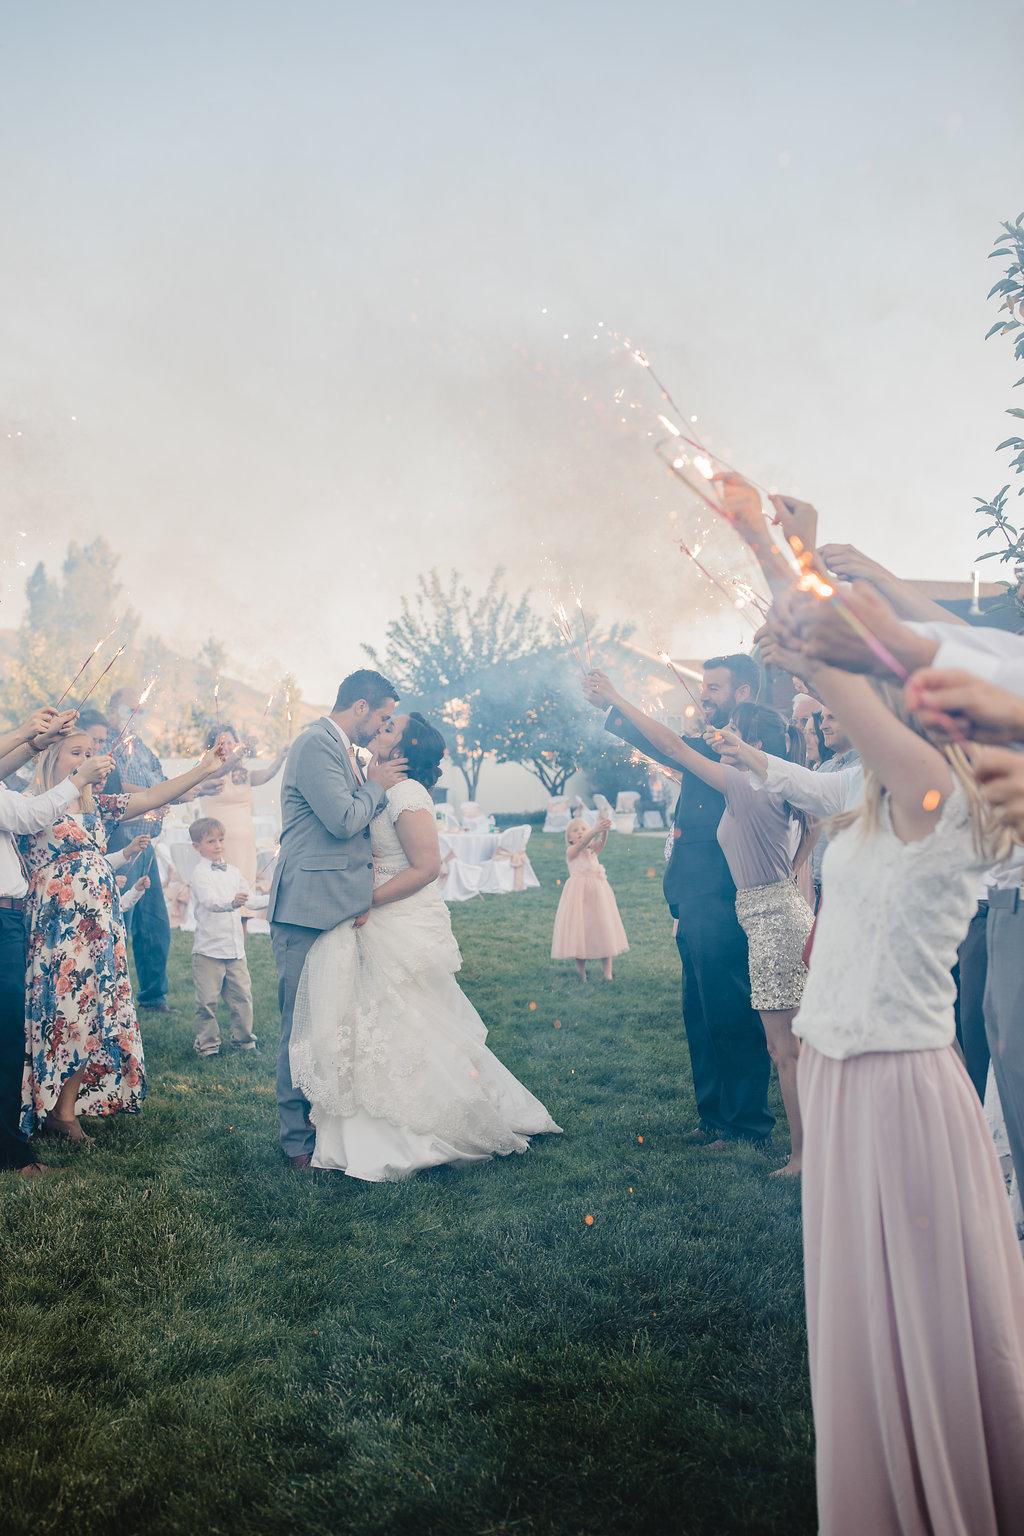 bride and groom send off with sparklers wedding day kiss monroe utah wedding photographer calli richards